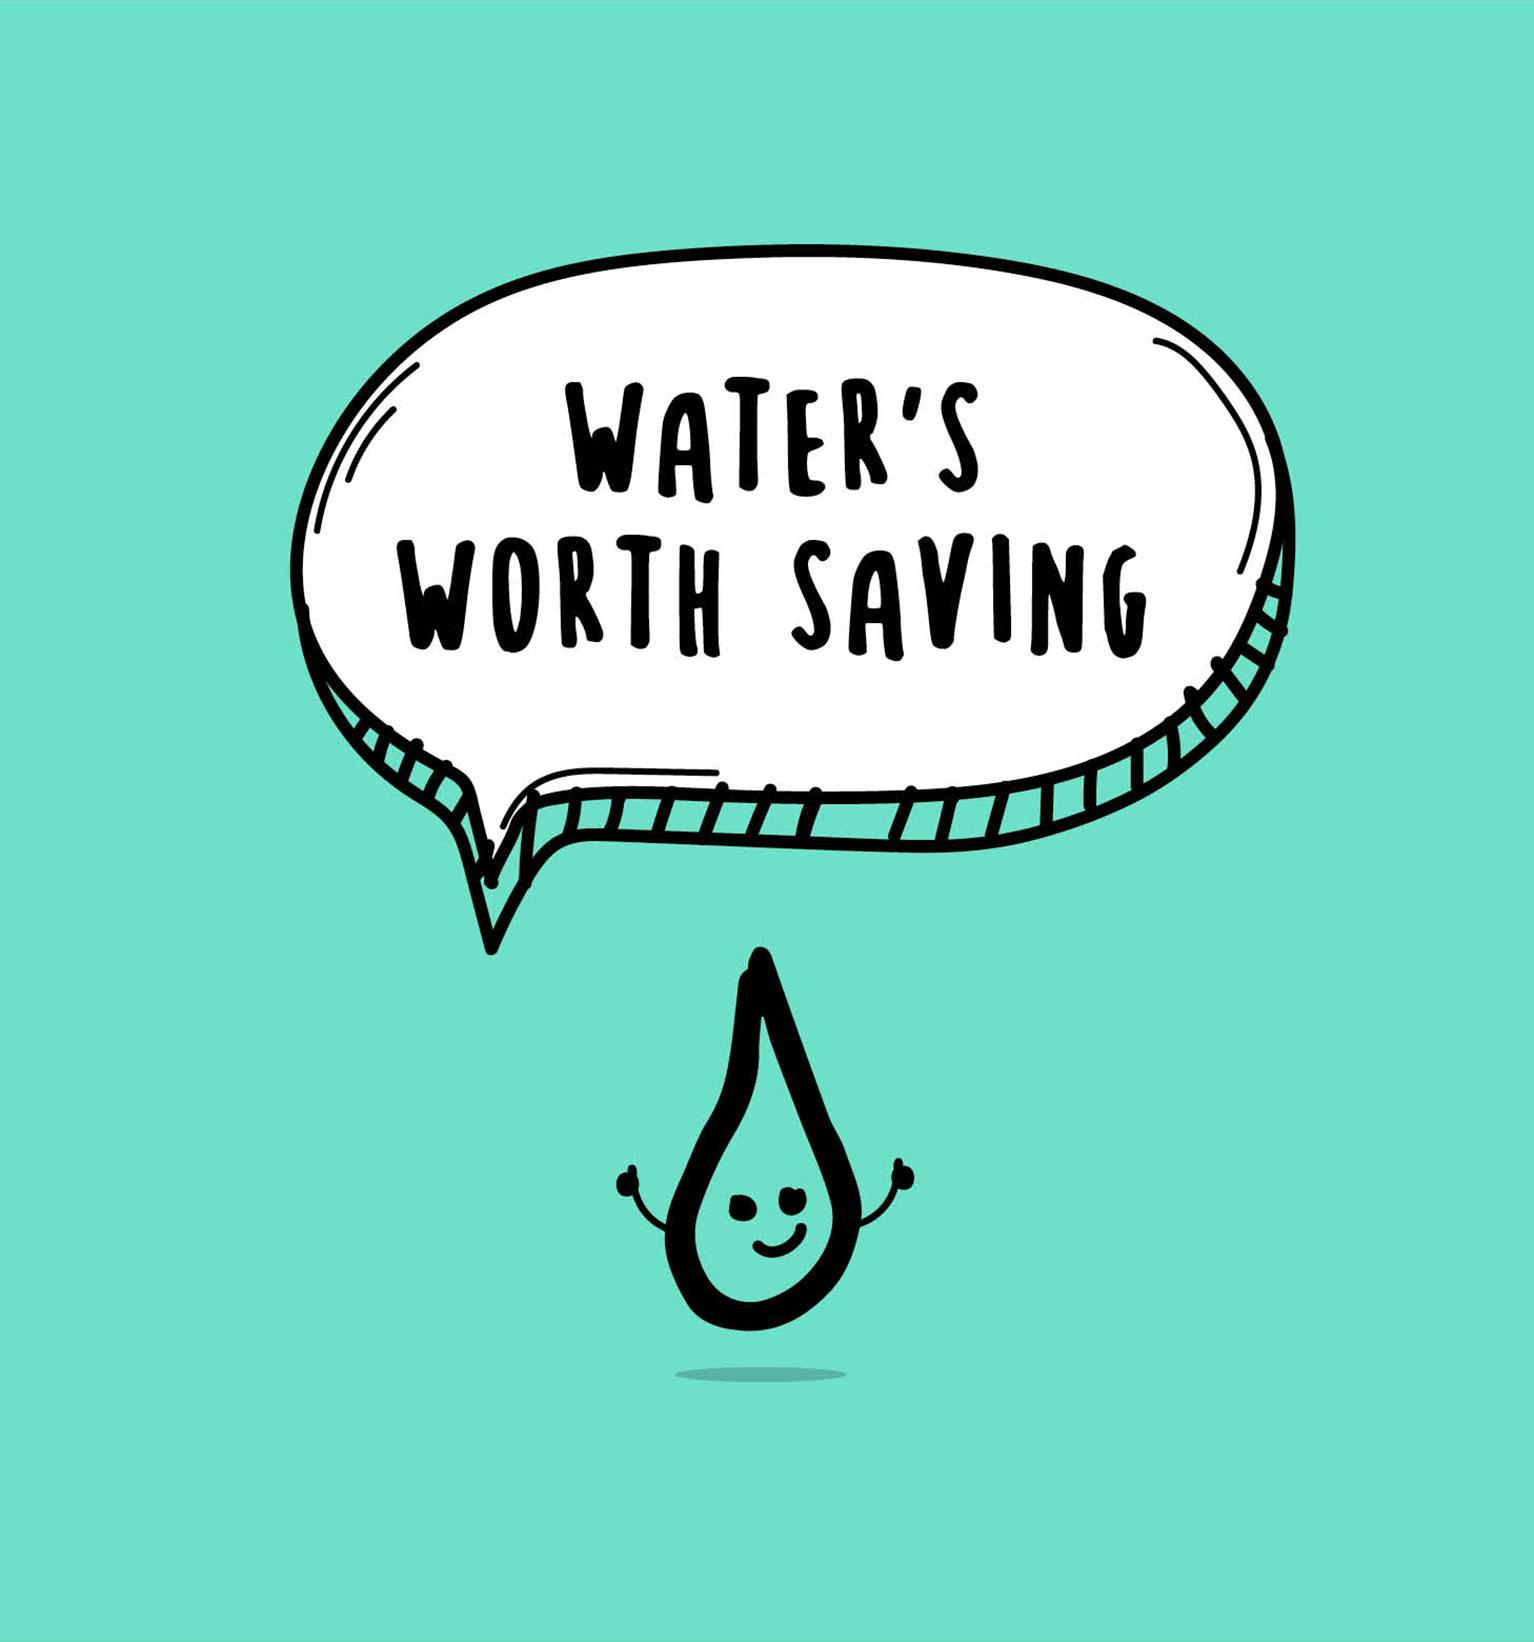 Waters Worth Saving